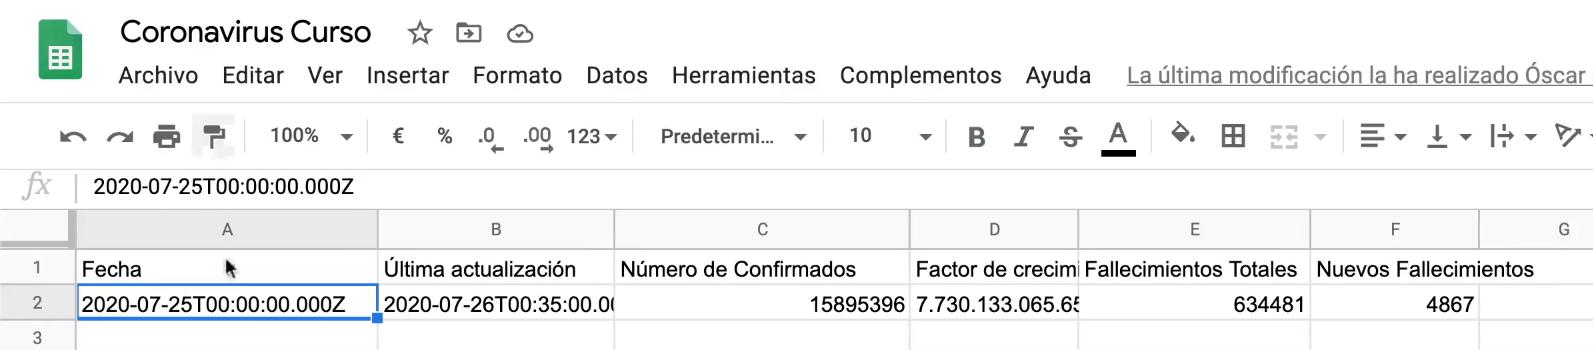 Datos actualizados Google Sheets